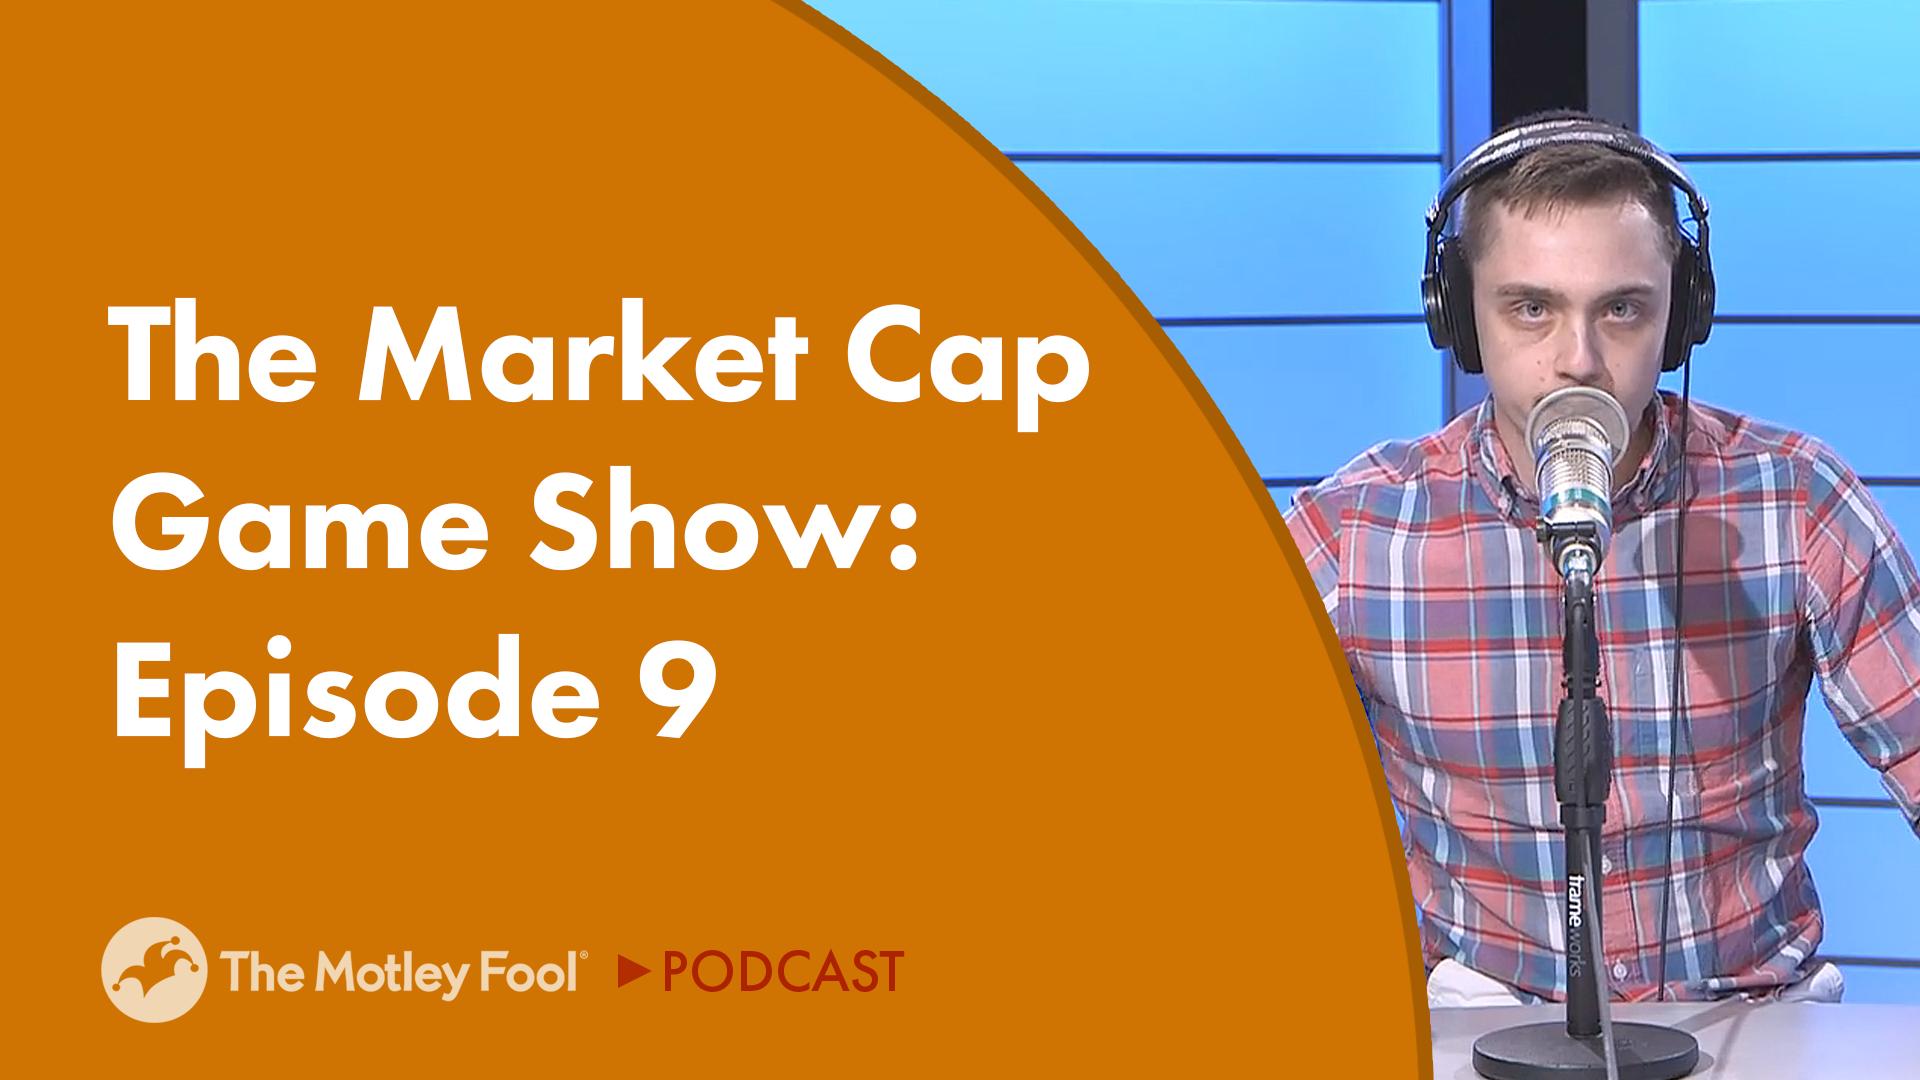 The Market Cap Game Show: Episode 9